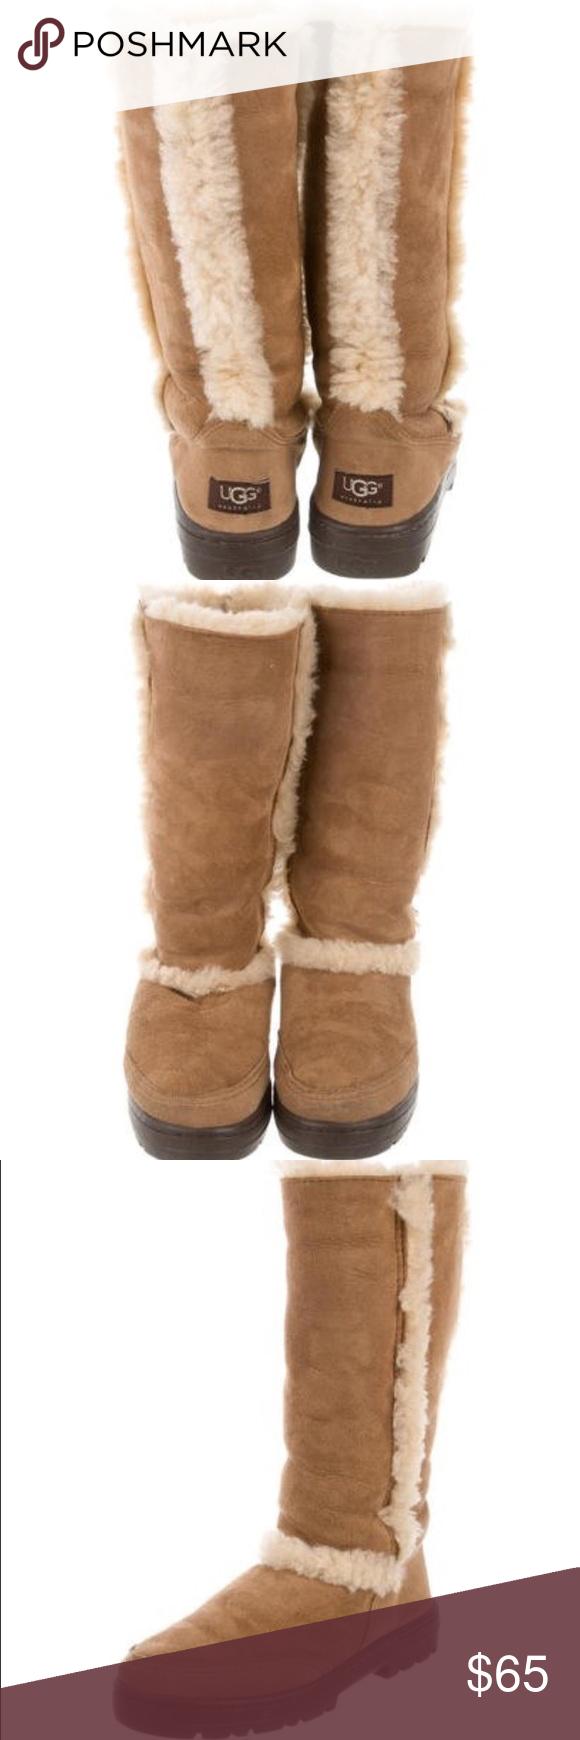 dillards uggs womens boots